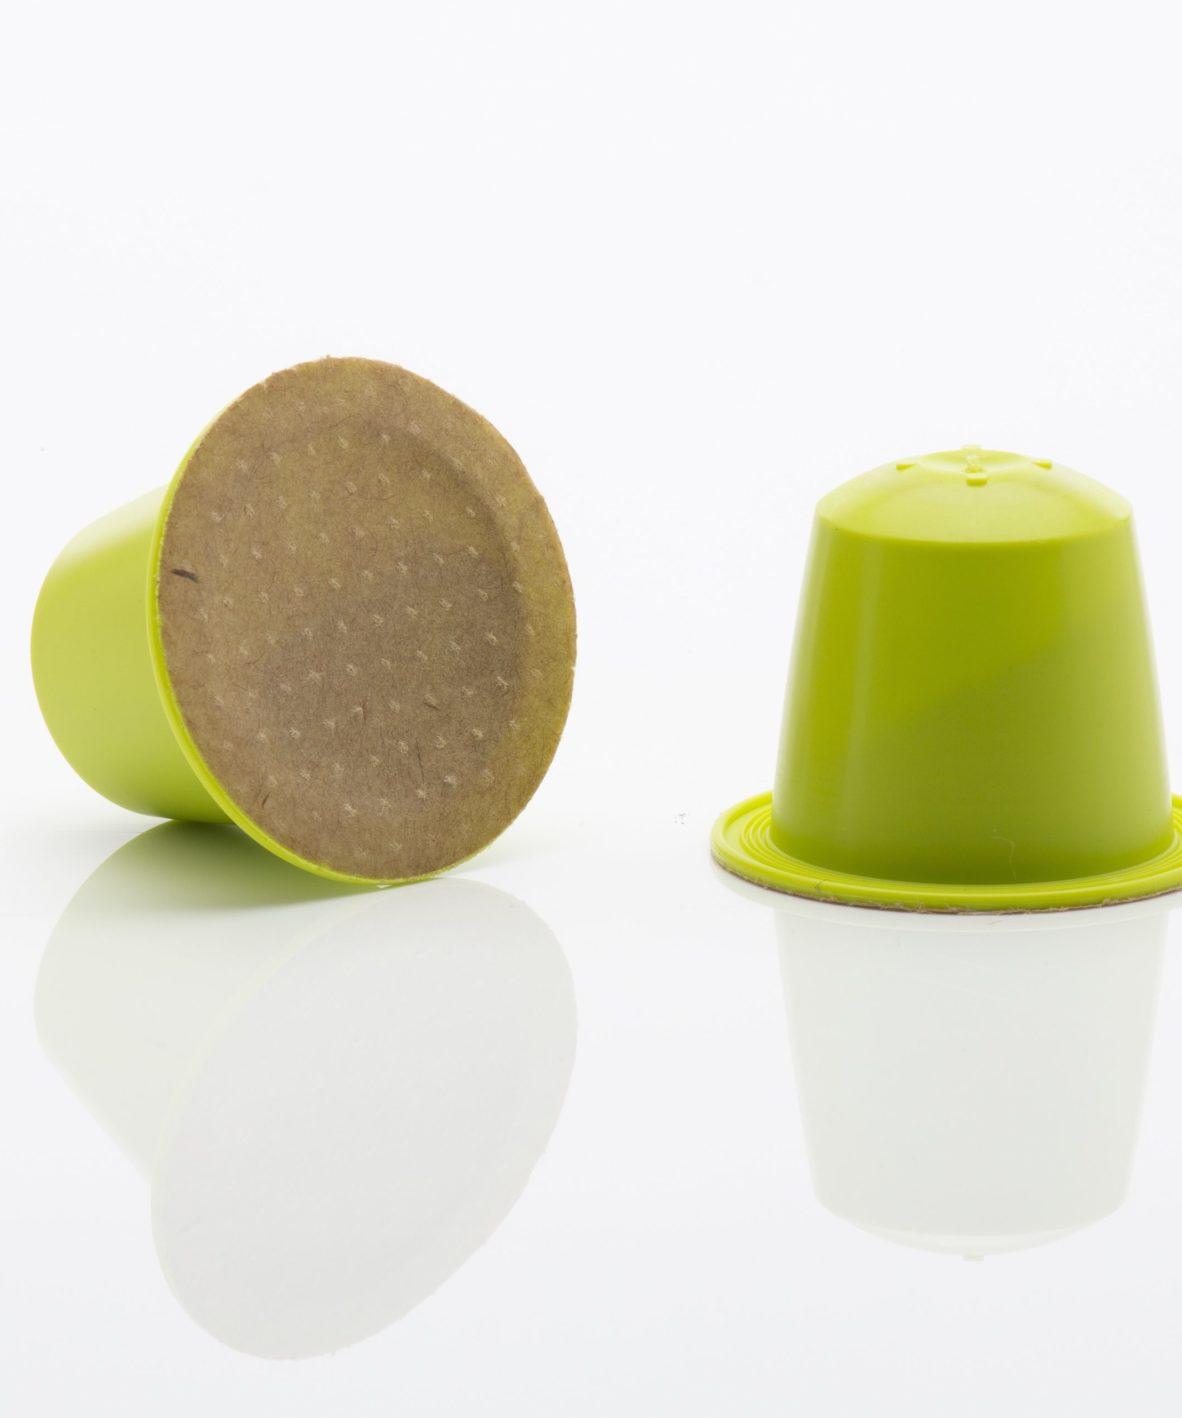 Maté thé vert et citron en capsule nespresso biodégradable Capsulebio